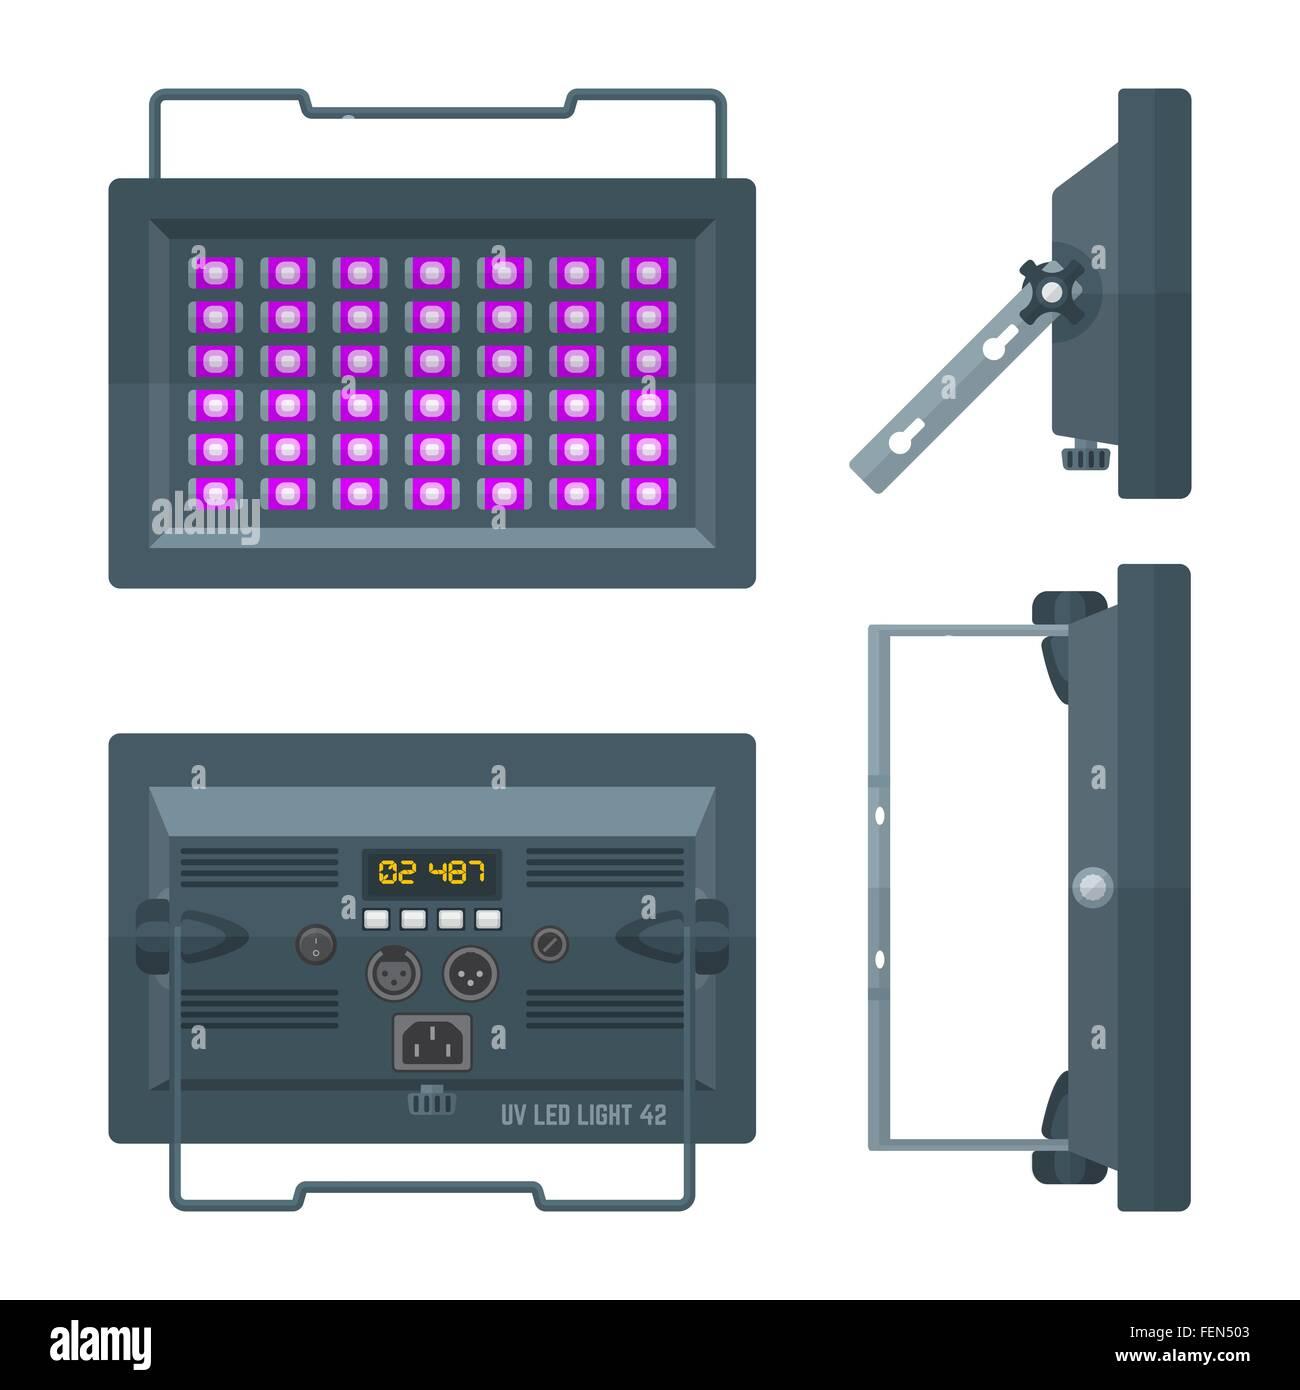 hight resolution of led ultraviolet blacklight professional stage projector lightning colored flat illustration white background